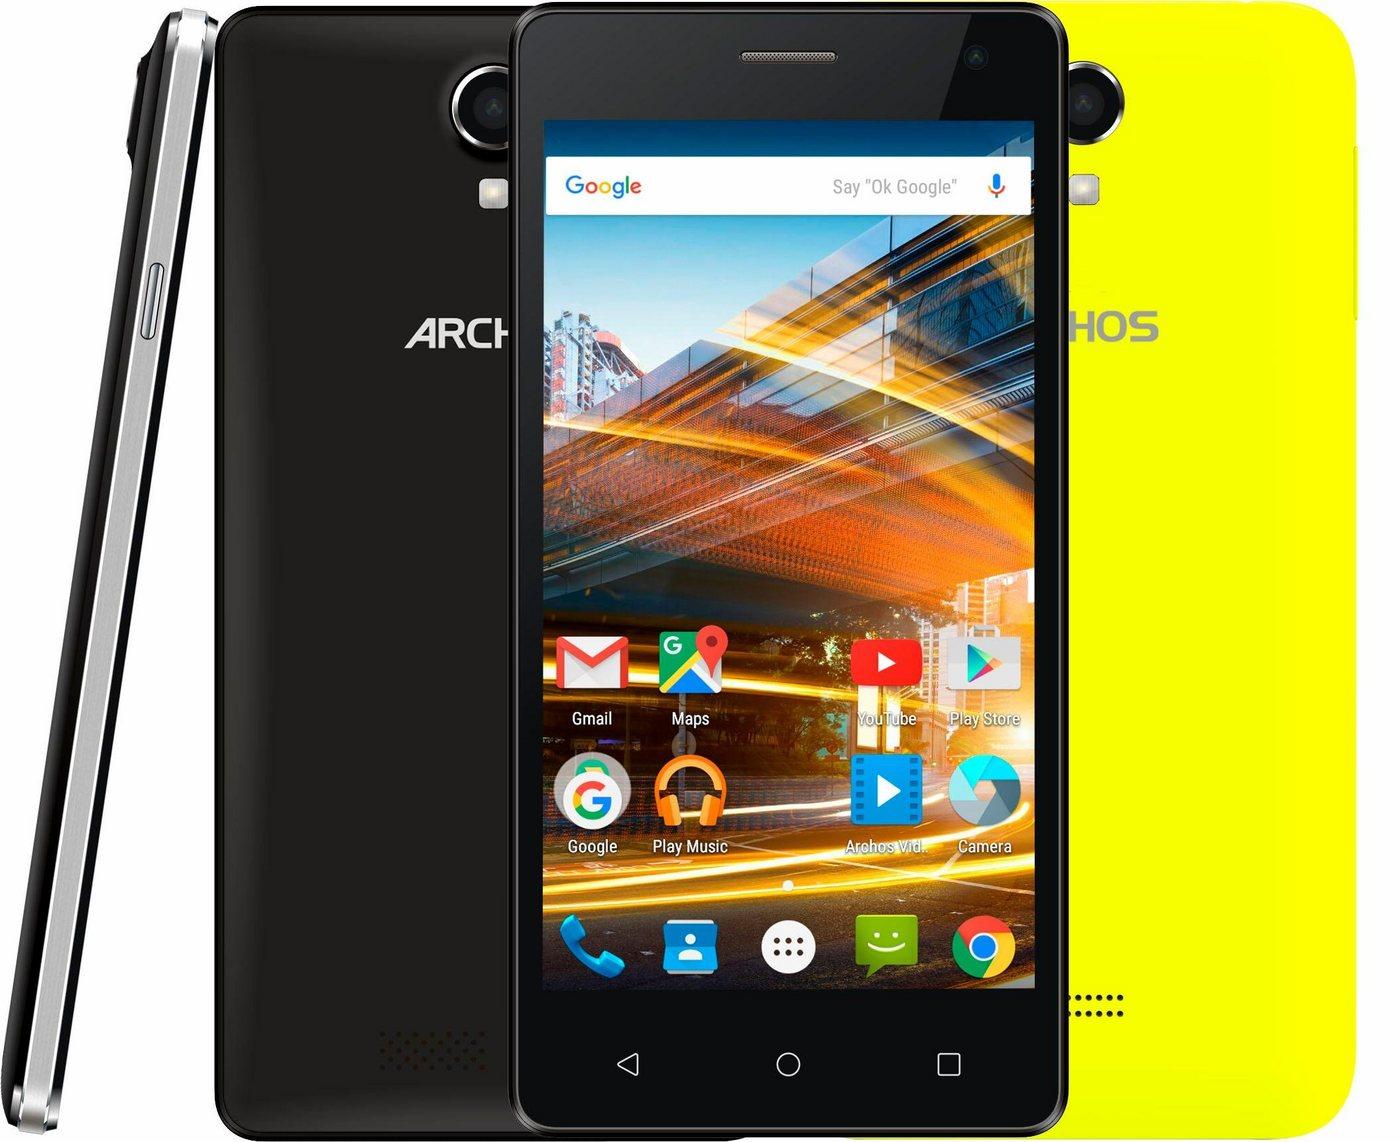 Archos 50d Neon Smartphone, 12,7 cm (5 Zoll) Display, Android 5.1 Lollipop, 8,0 Megapixel - Preisvergleich